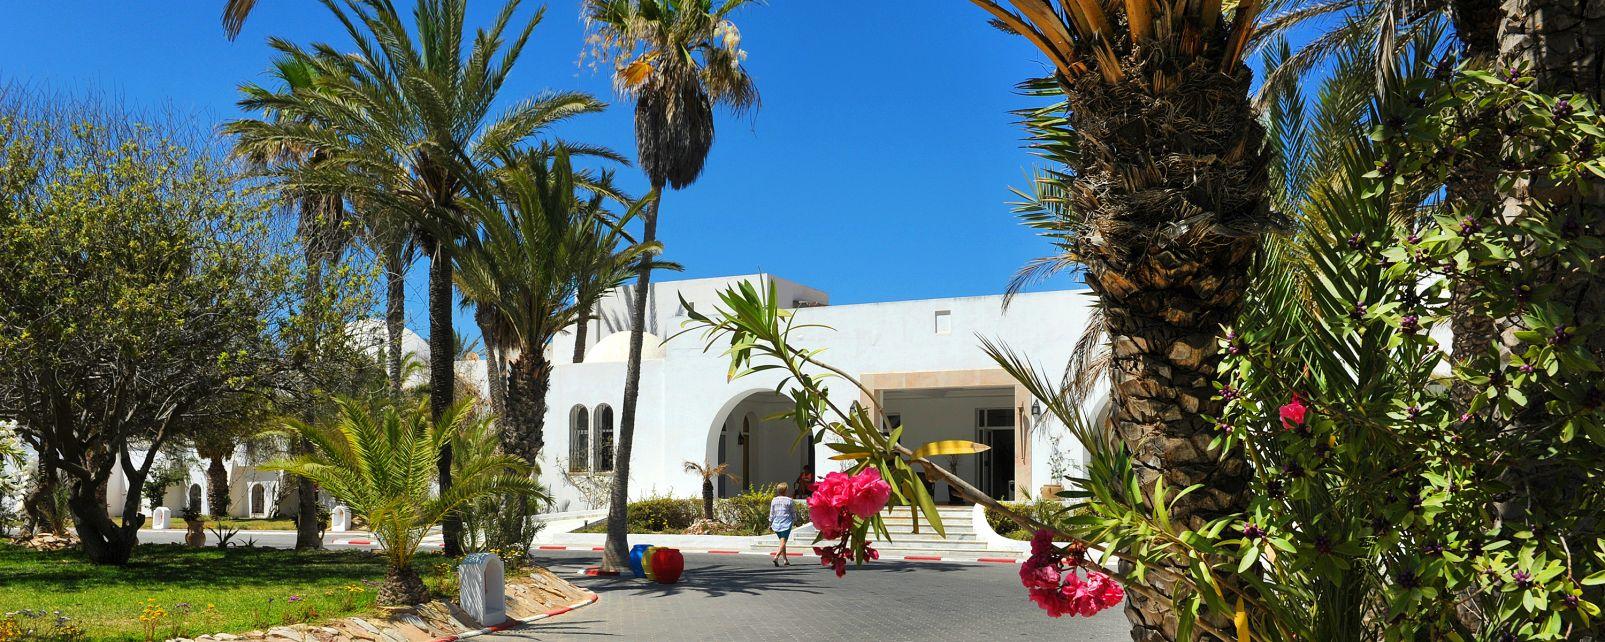 Hotel meninx in djerba tunisia for Hotels djerba